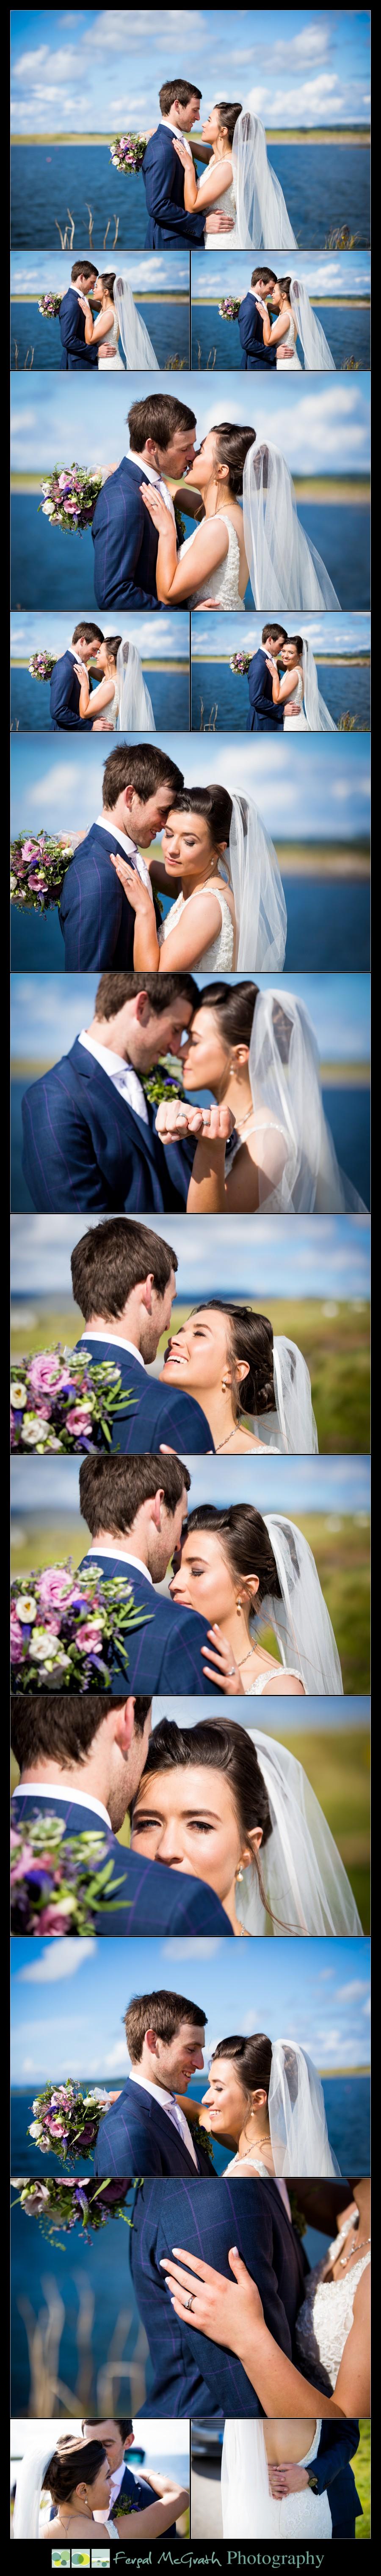 Clayton Hotel Sligo Wedding stunning bride and groom wedding photos